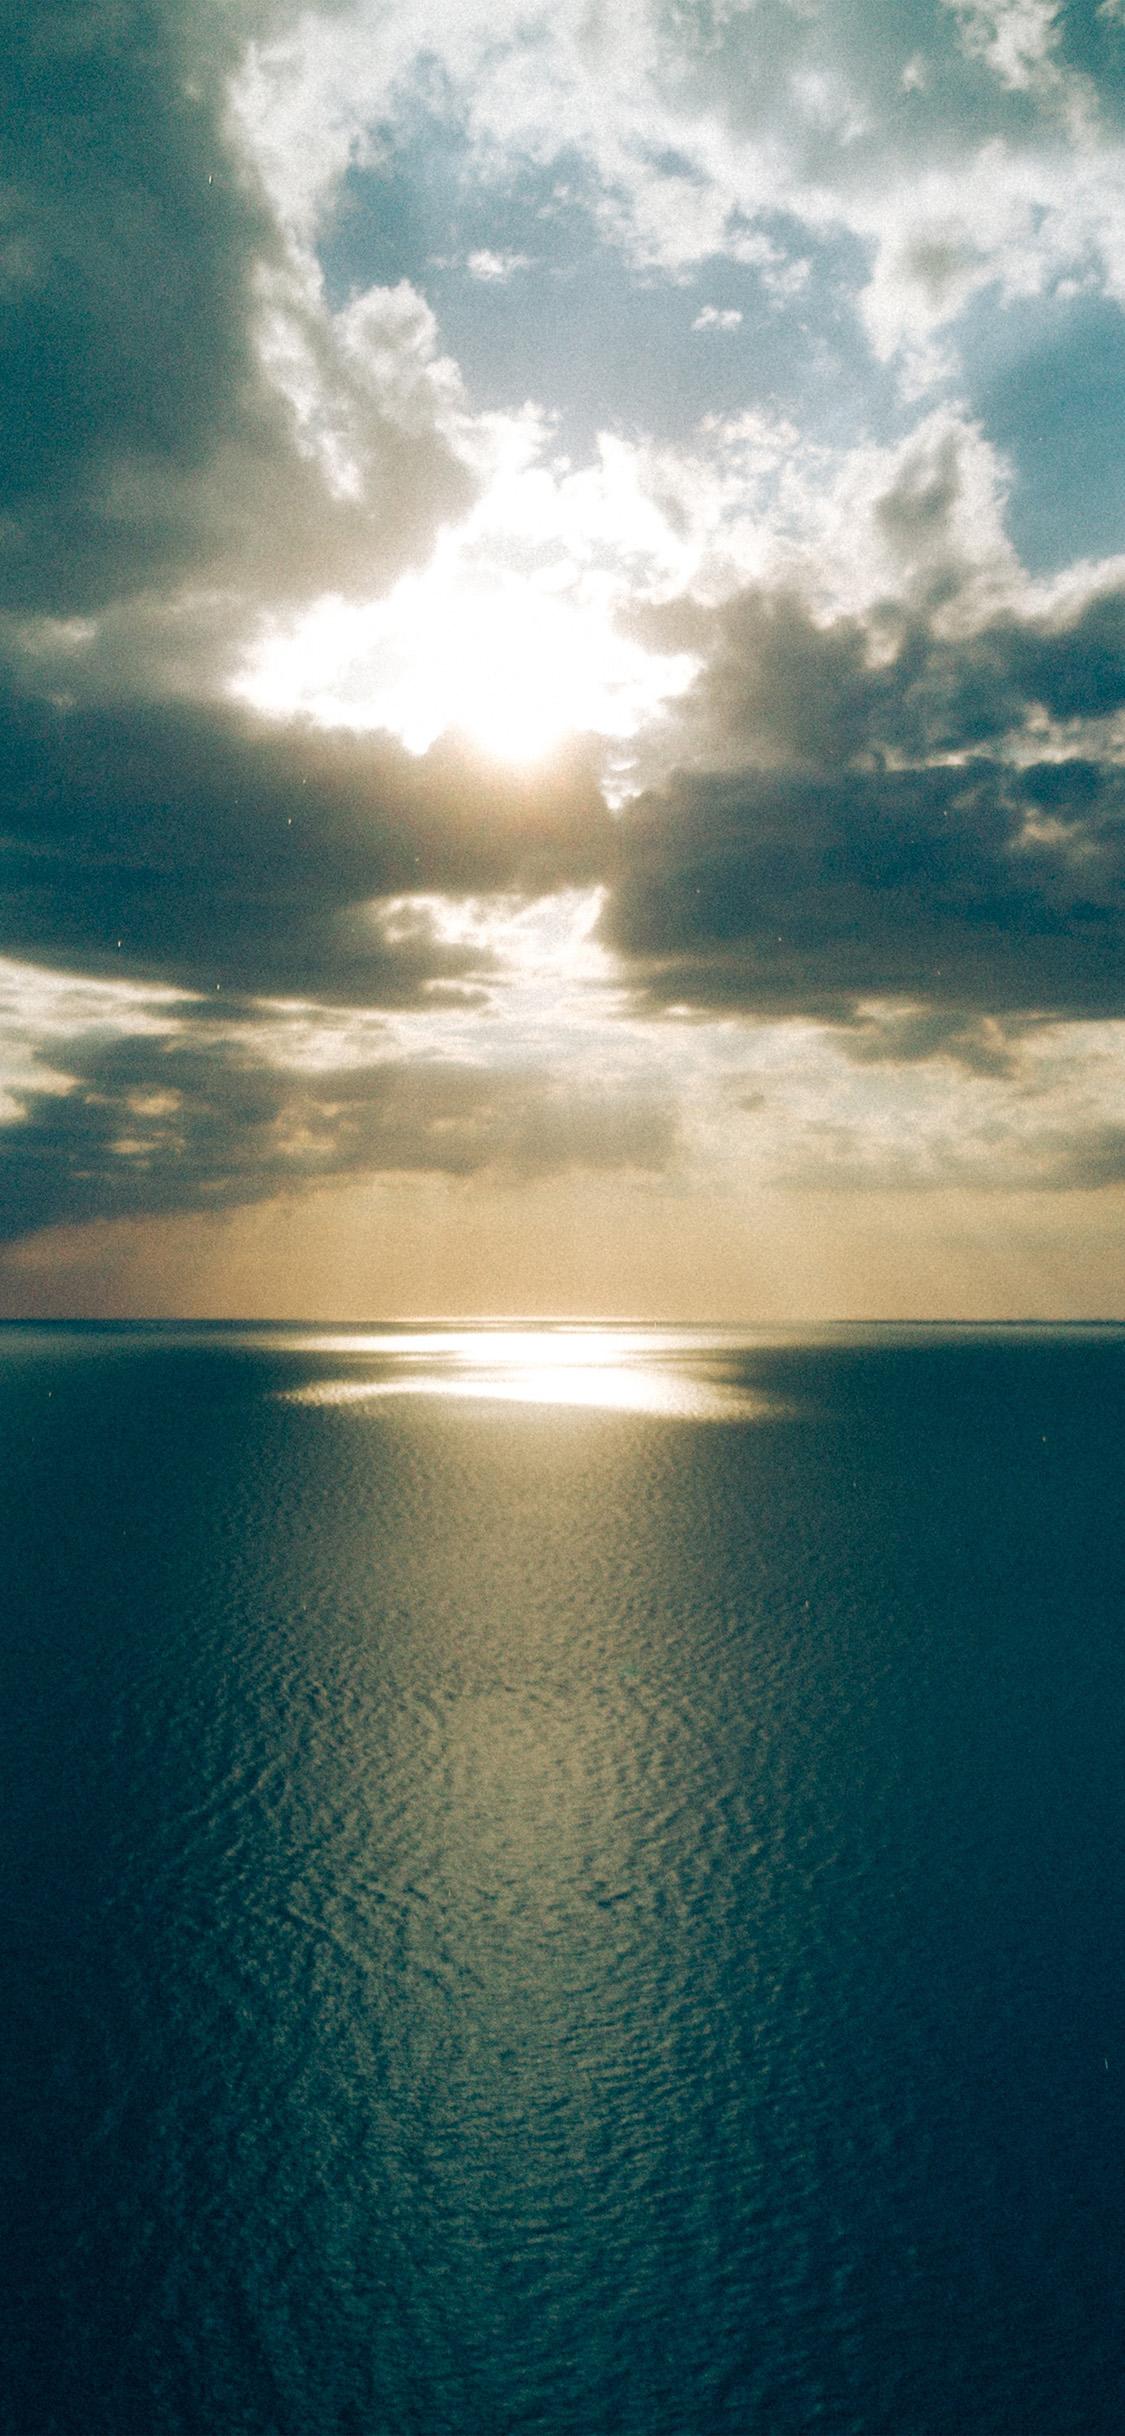 iPhonexpapers.com-Apple-iPhone-wallpaper-ny99-sea-sun-cloud-ocean-nature